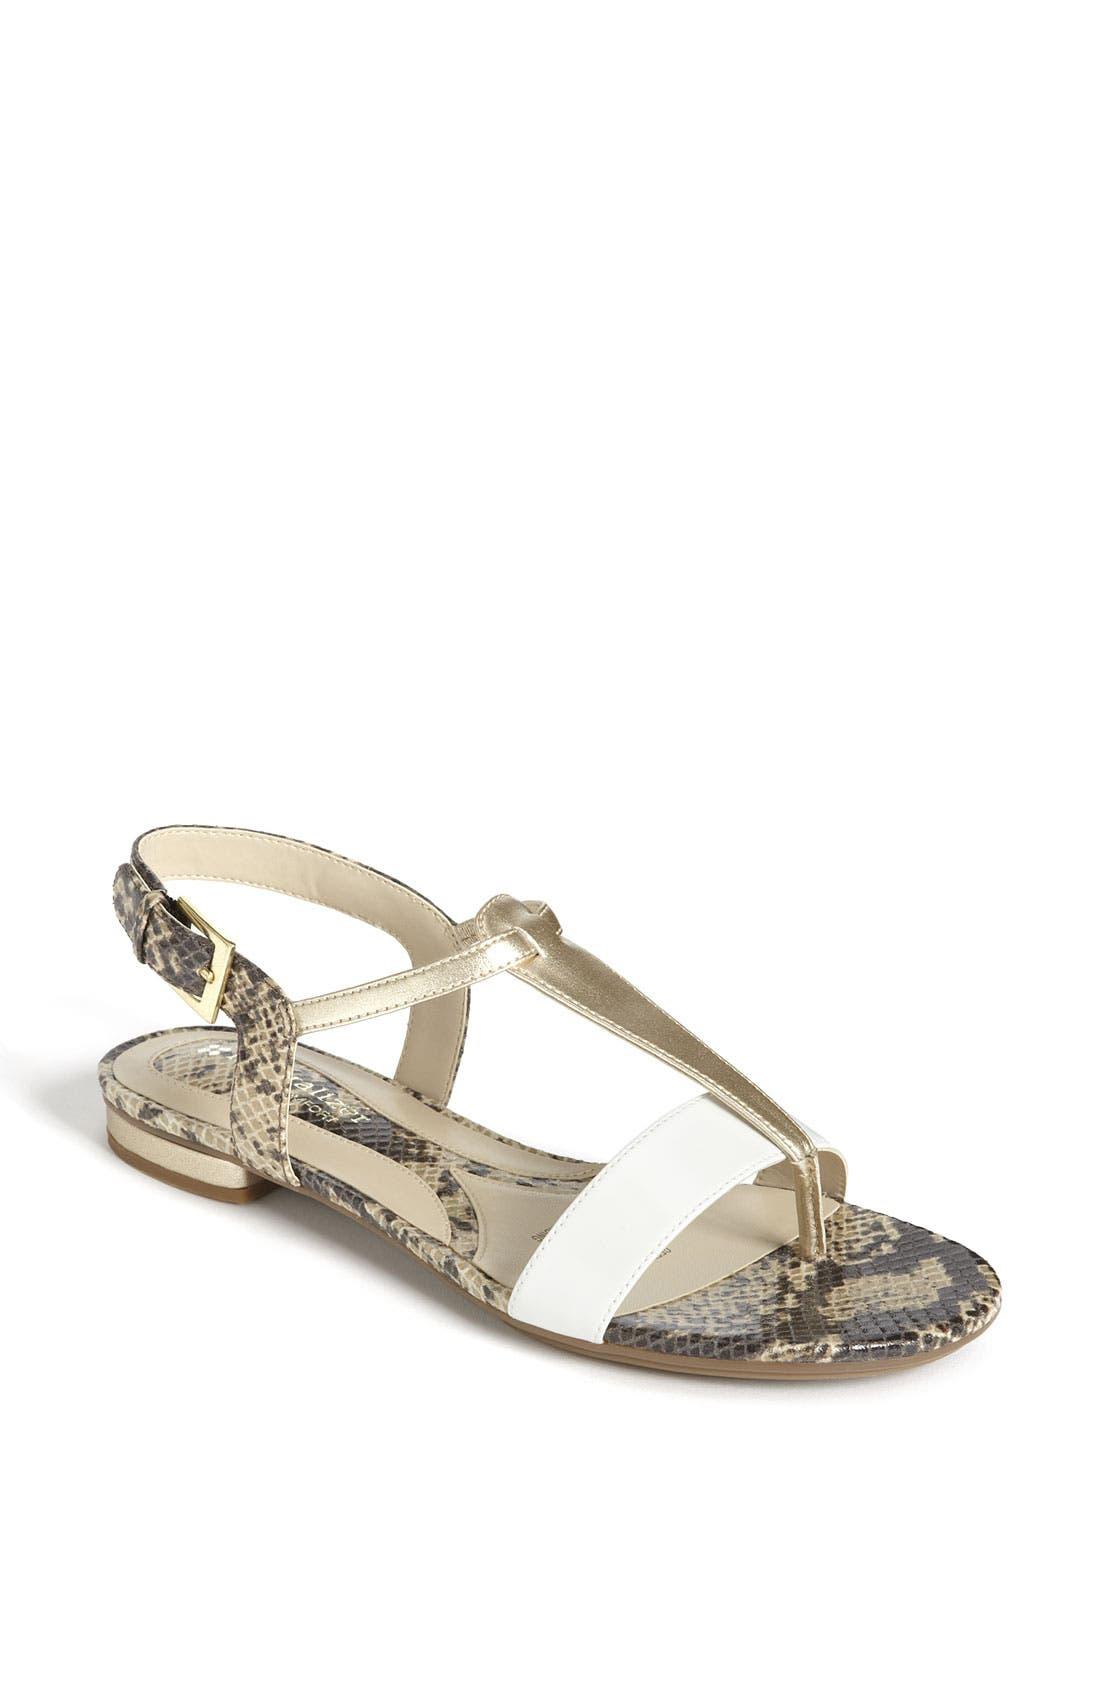 Main Image - Naturalizer 'Fira' Sandal